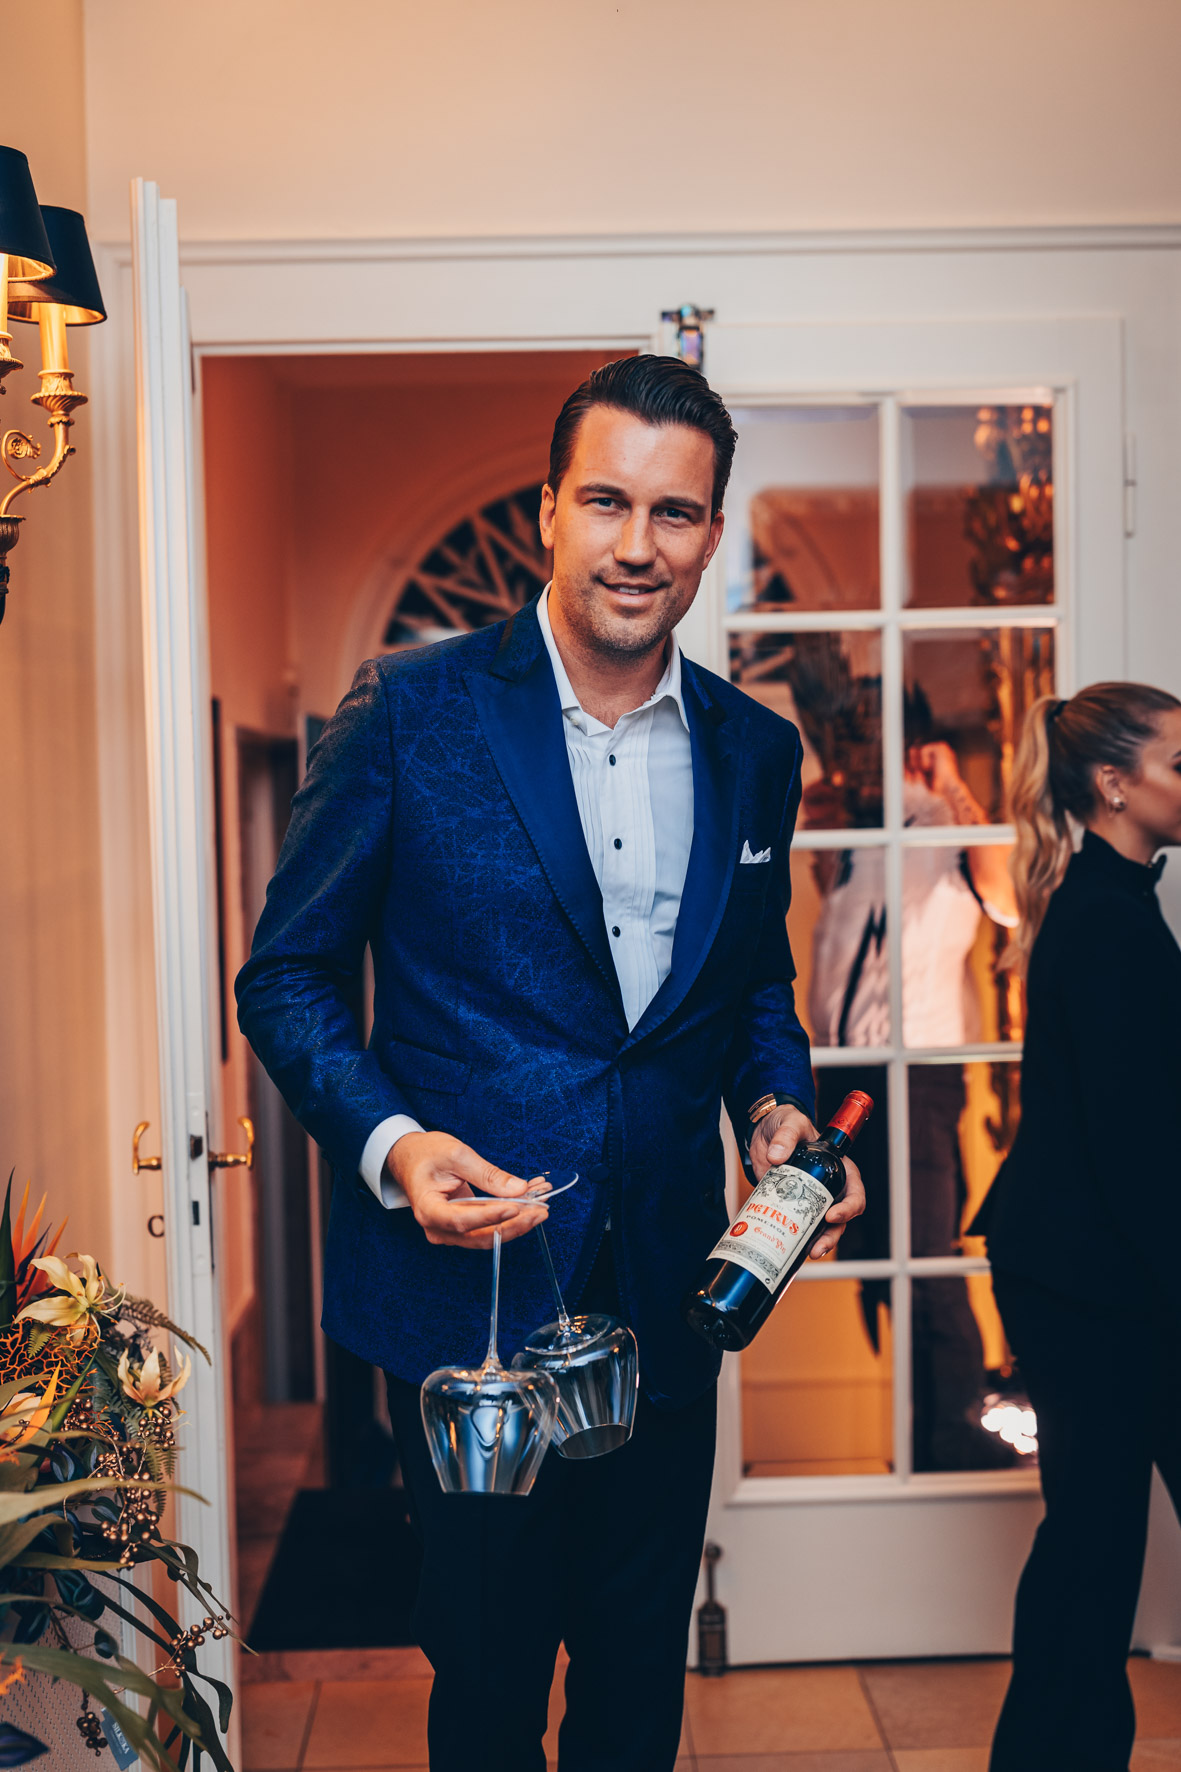 Konrad-lifestyle-art-basel-%22grand-party%22-2019-69.jpg